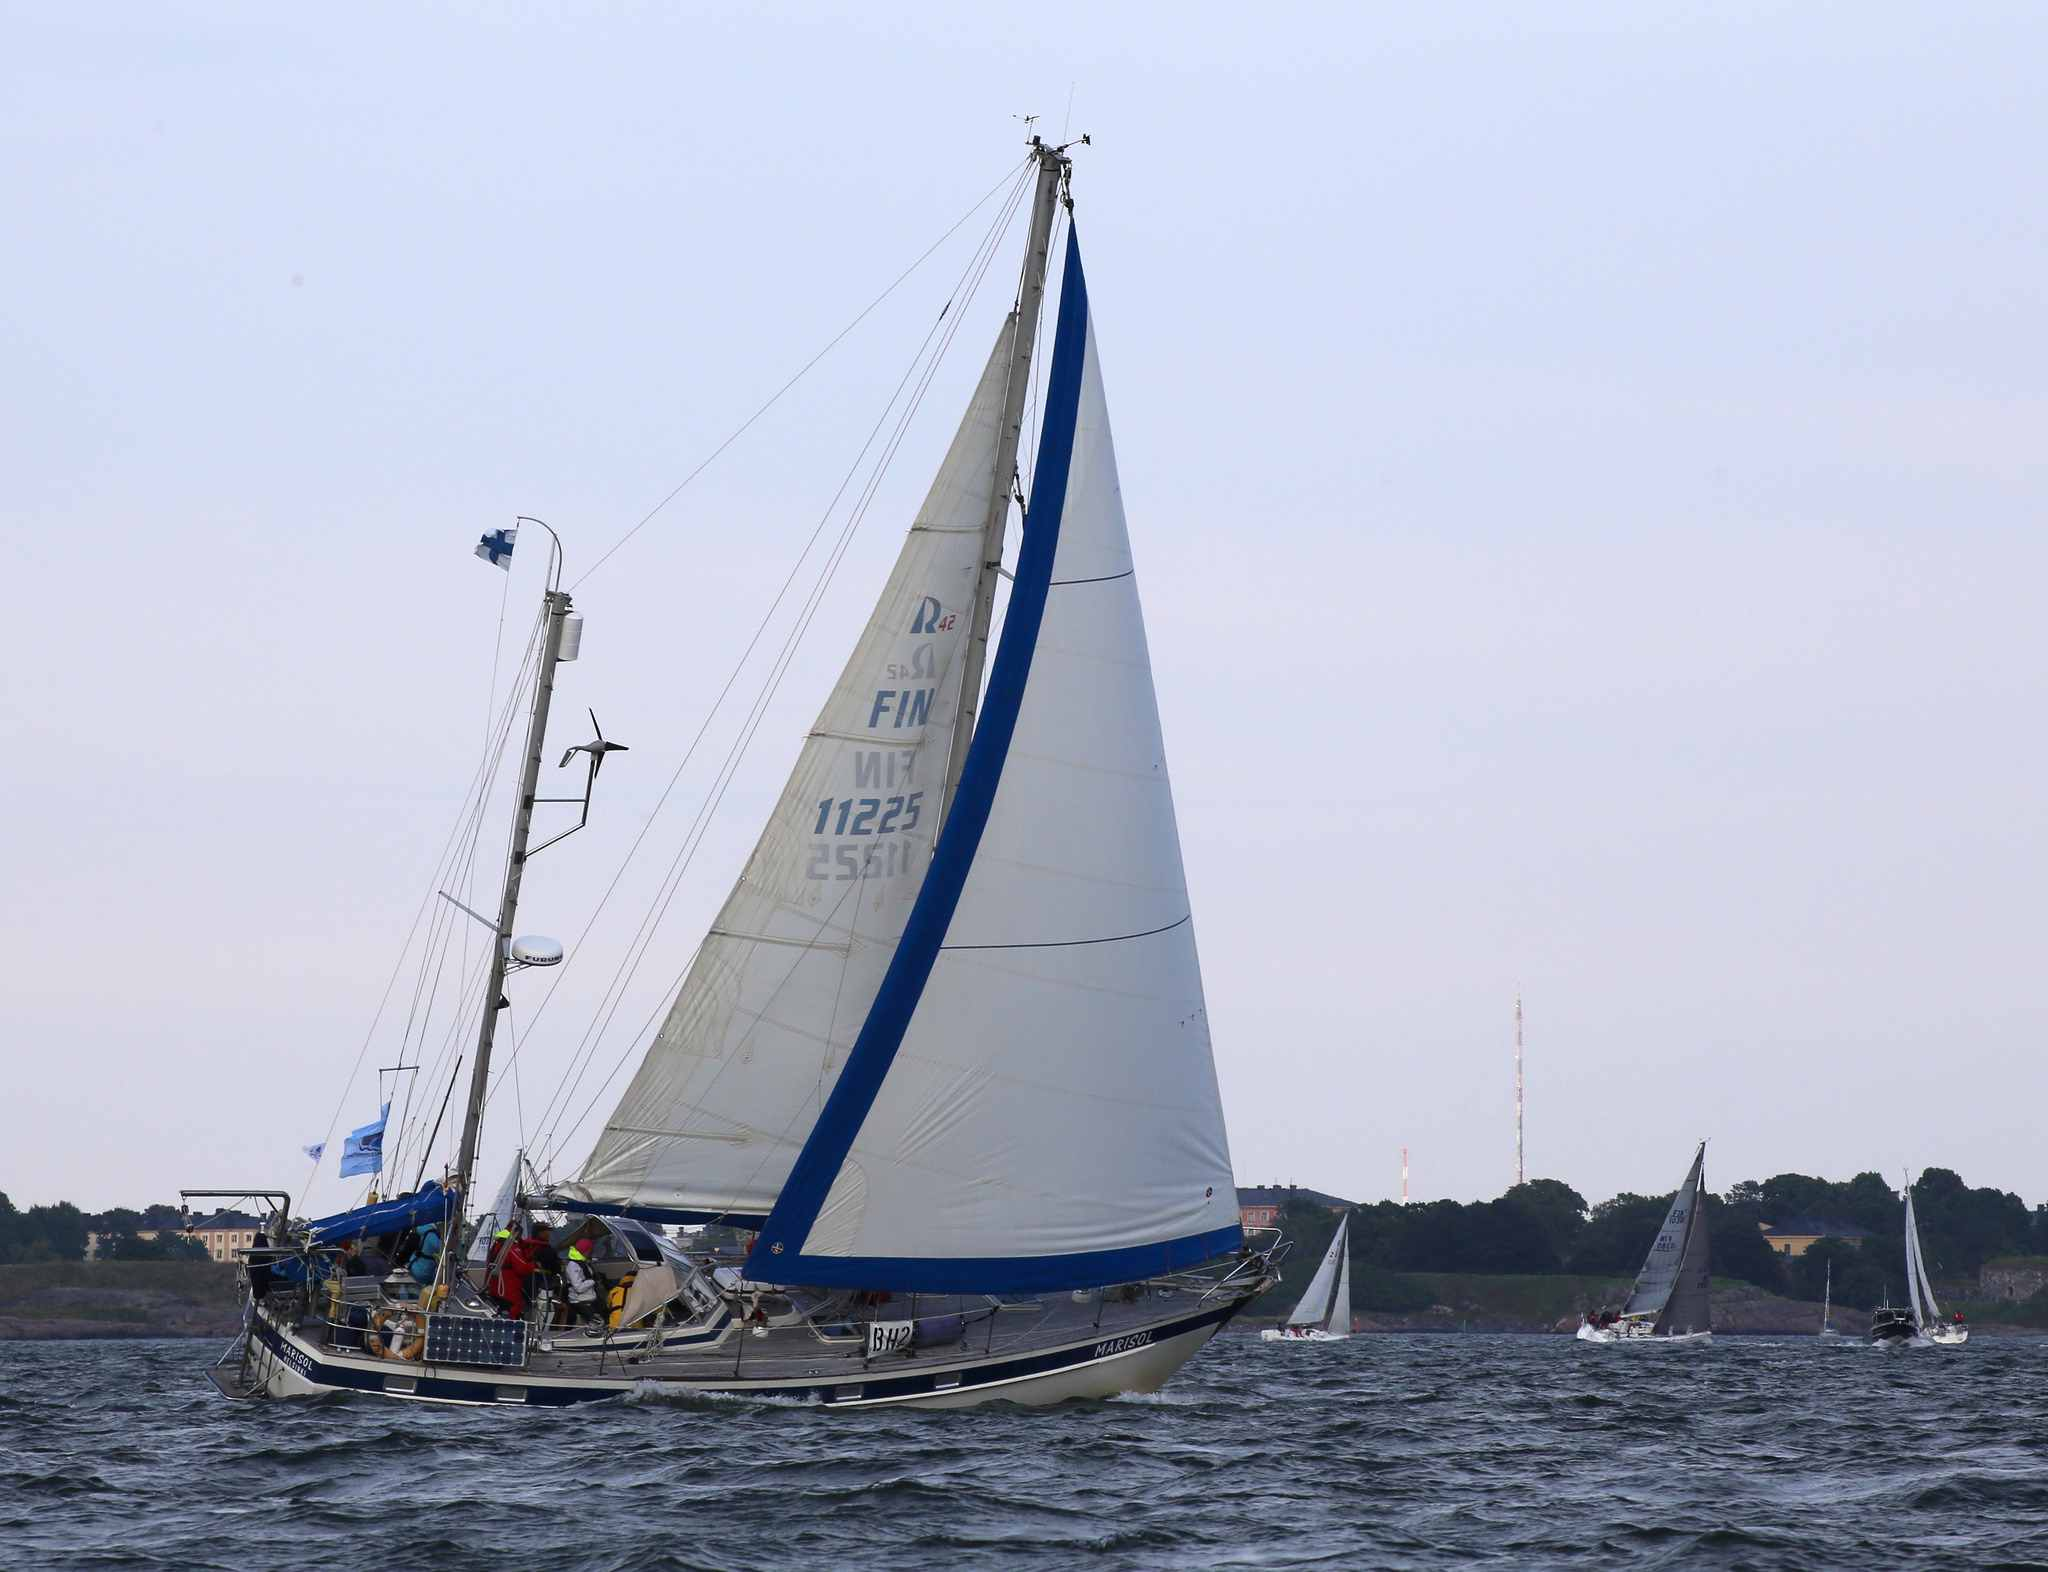 Hallberg-Rassy 42 Ketch sailing on the water